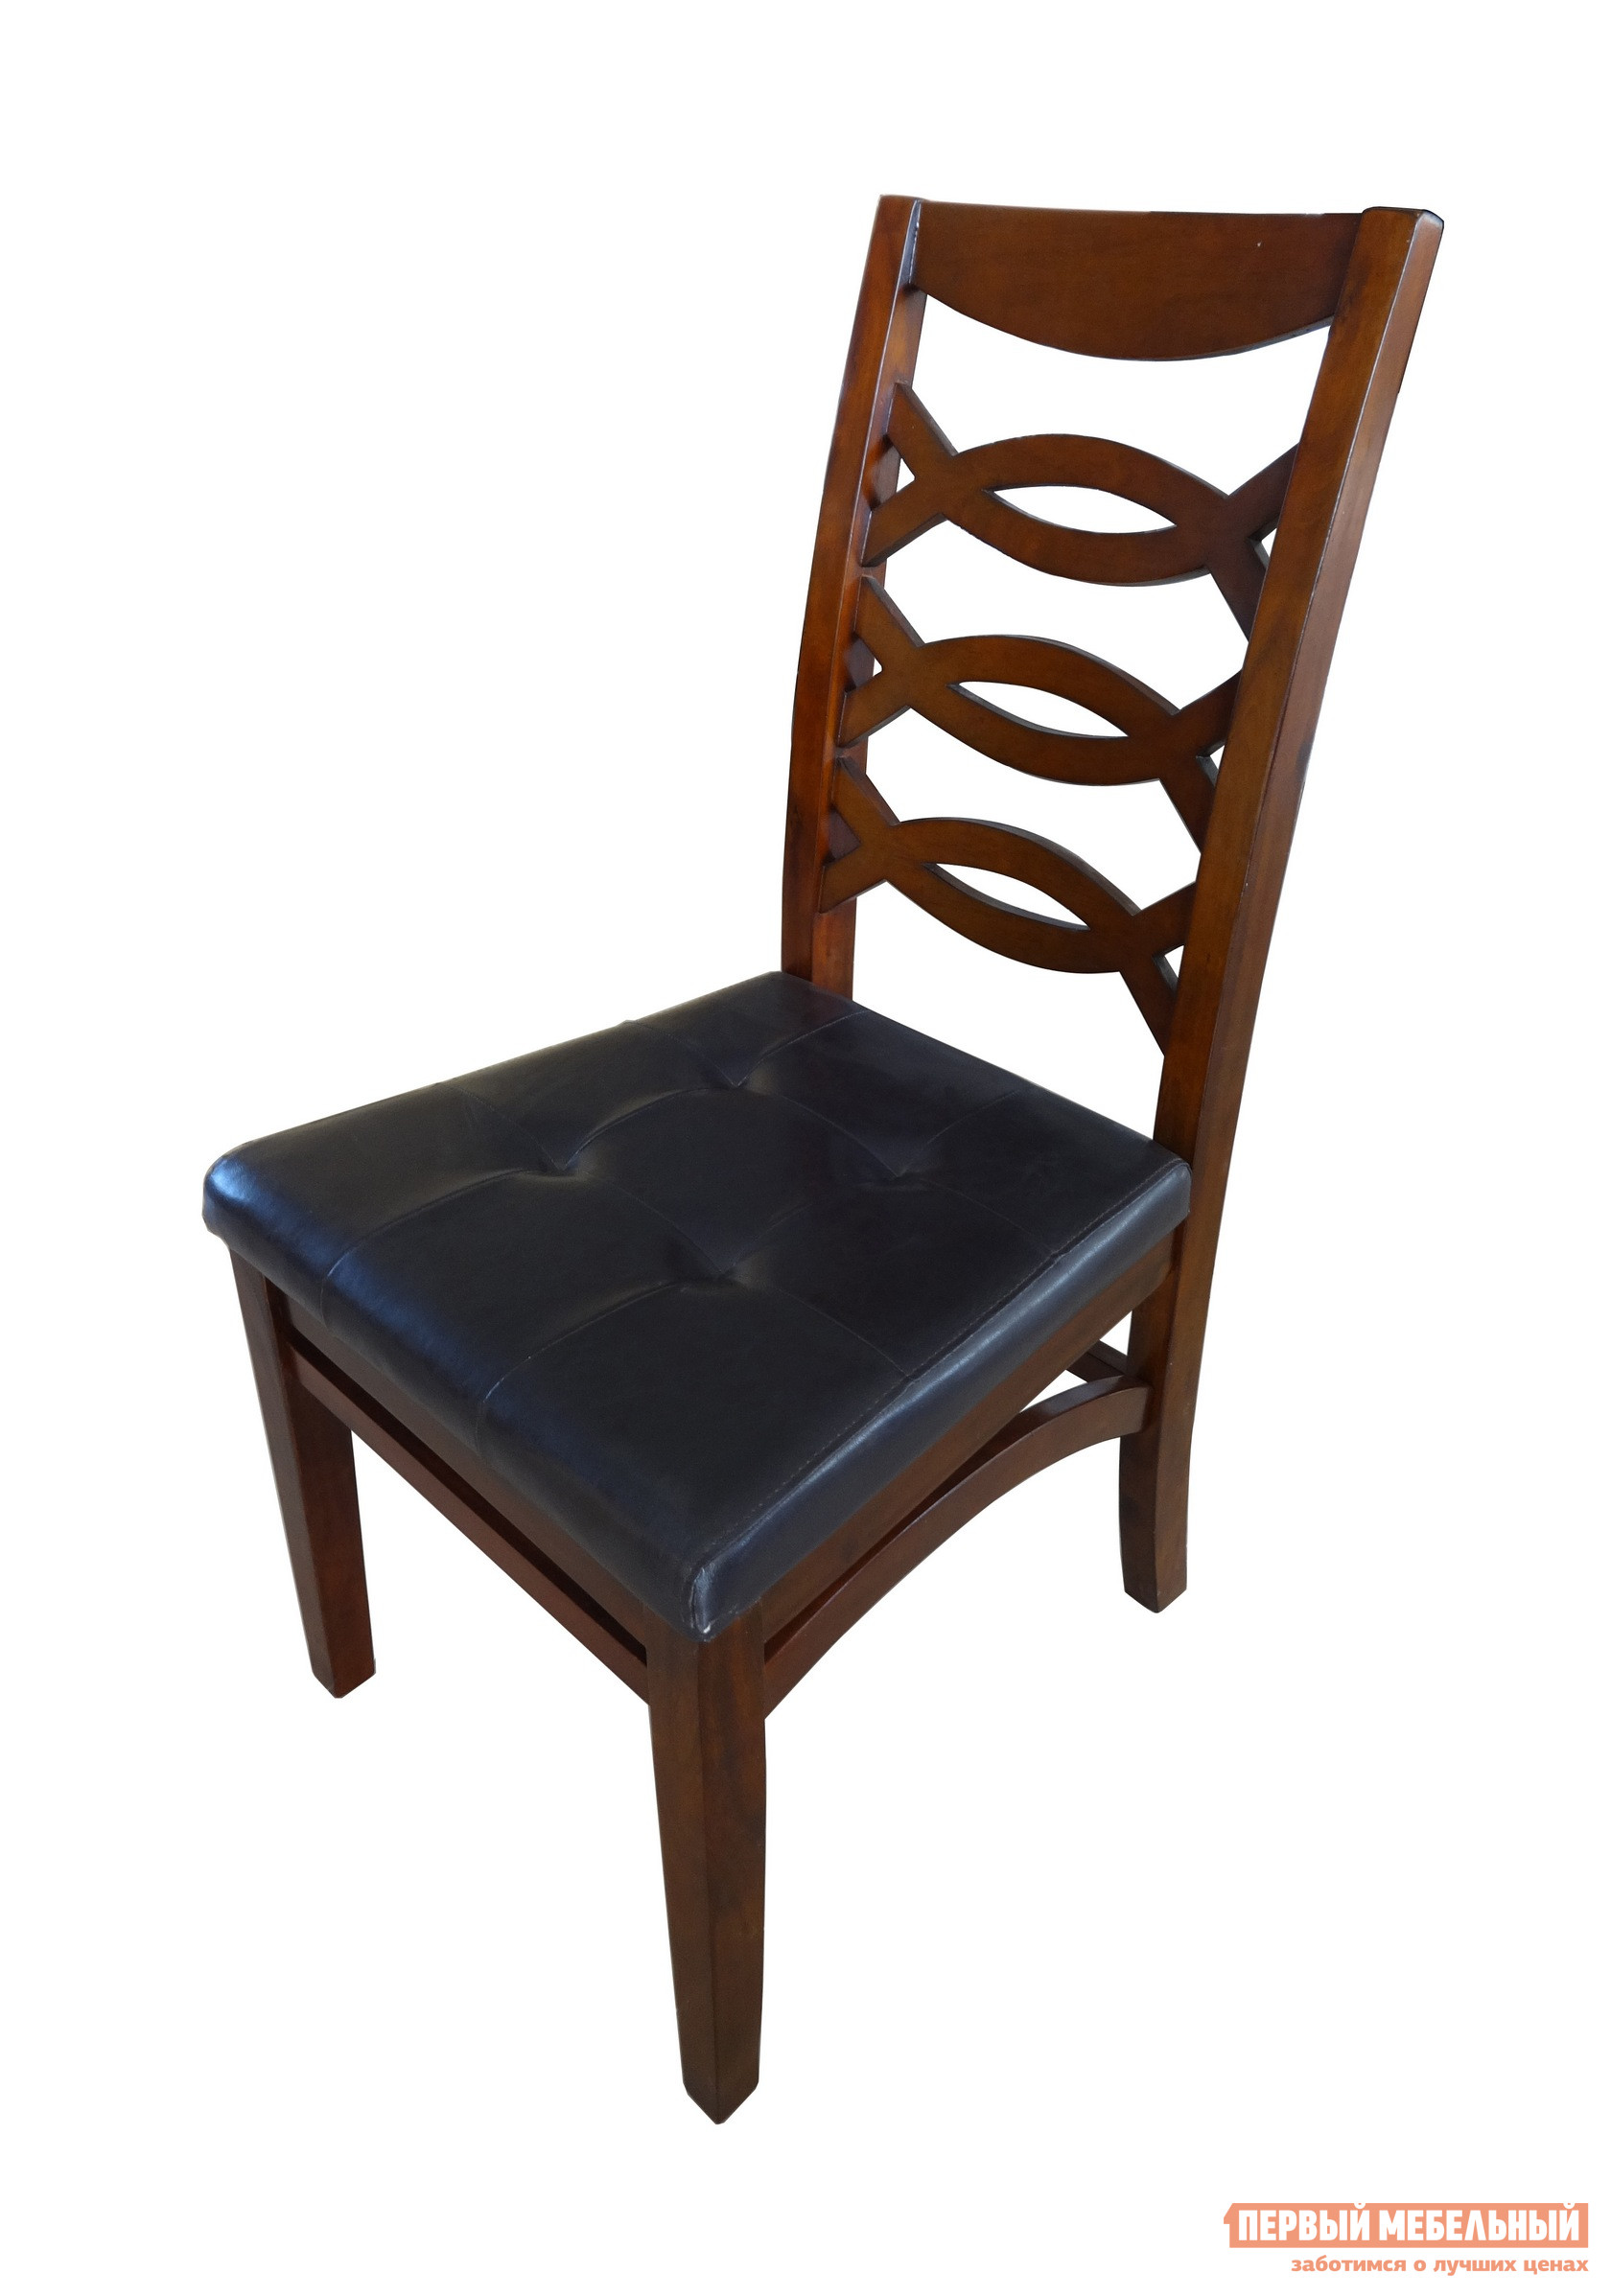 Кухонный стул Tetchair 863 - 48 SC стул компьютерный tetchair step